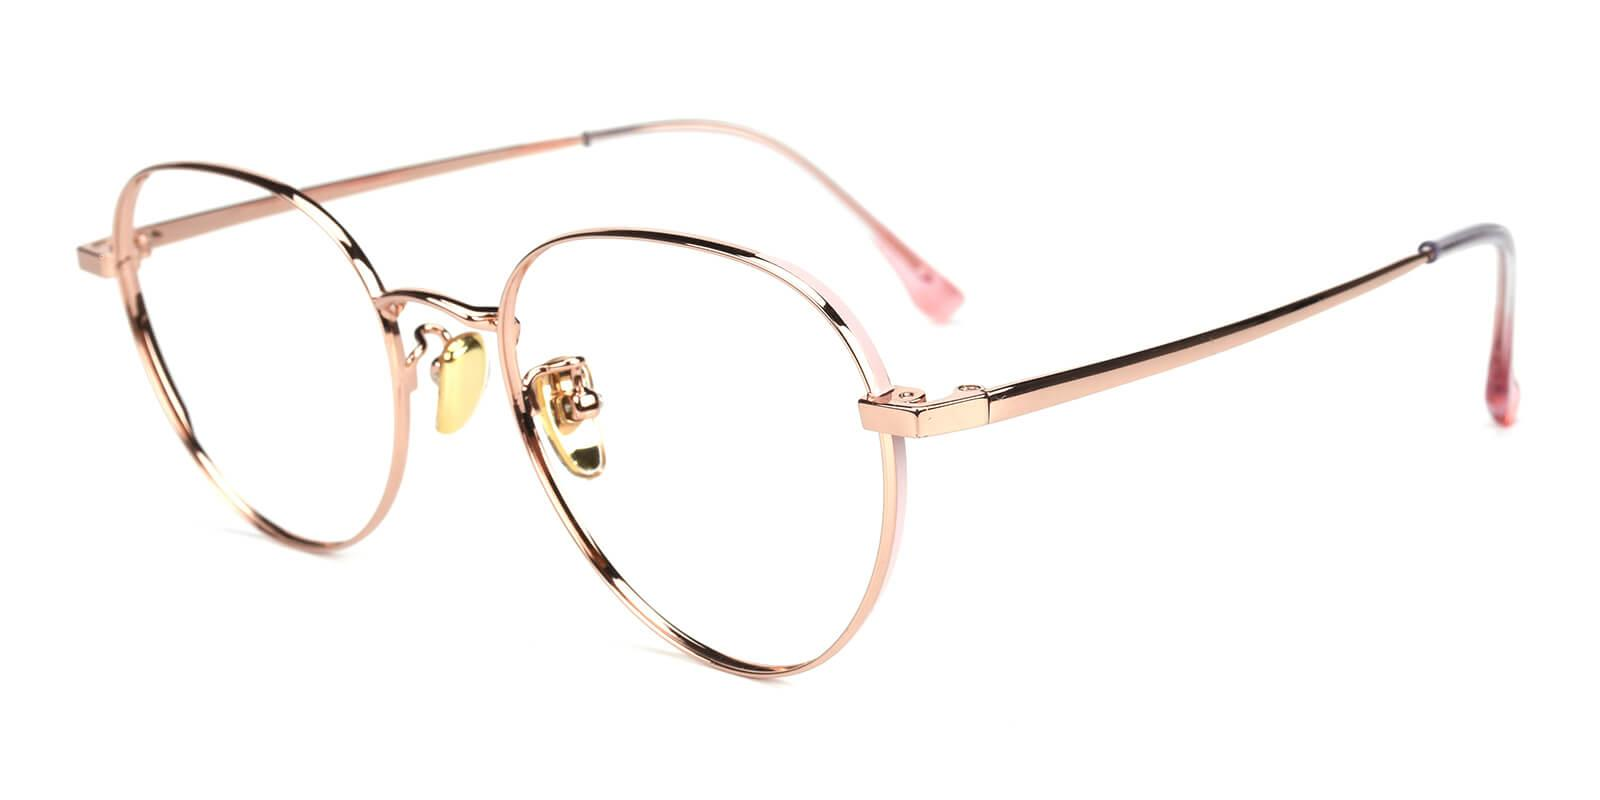 Serina-Gold-Round-Titanium-Eyeglasses-additional1